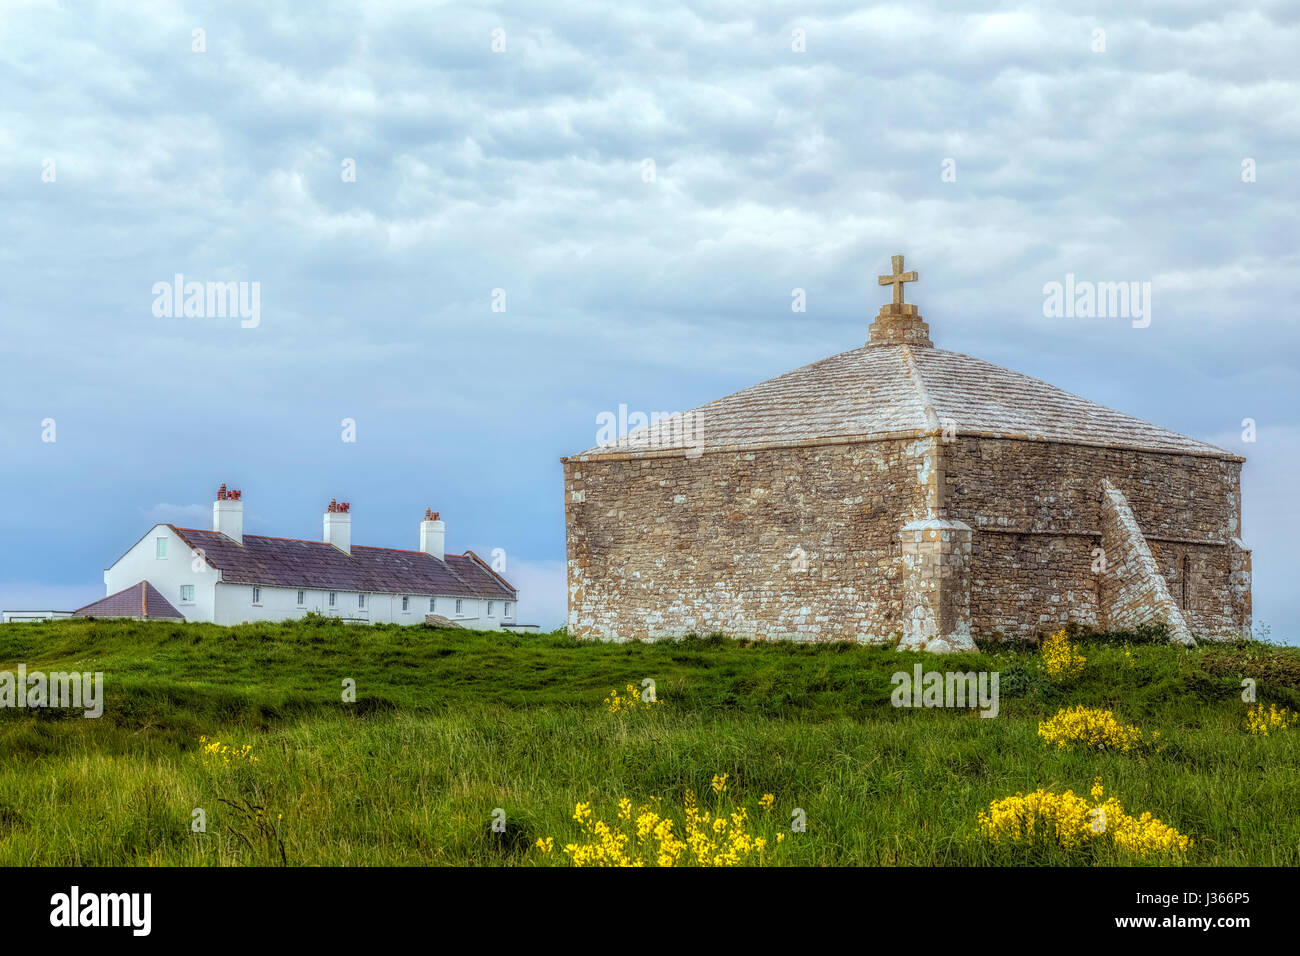 St Adhelm's chapel, Adhelm's Head, Purbeck, Jurassic Coast, Dorset, England - Stock-Bilder